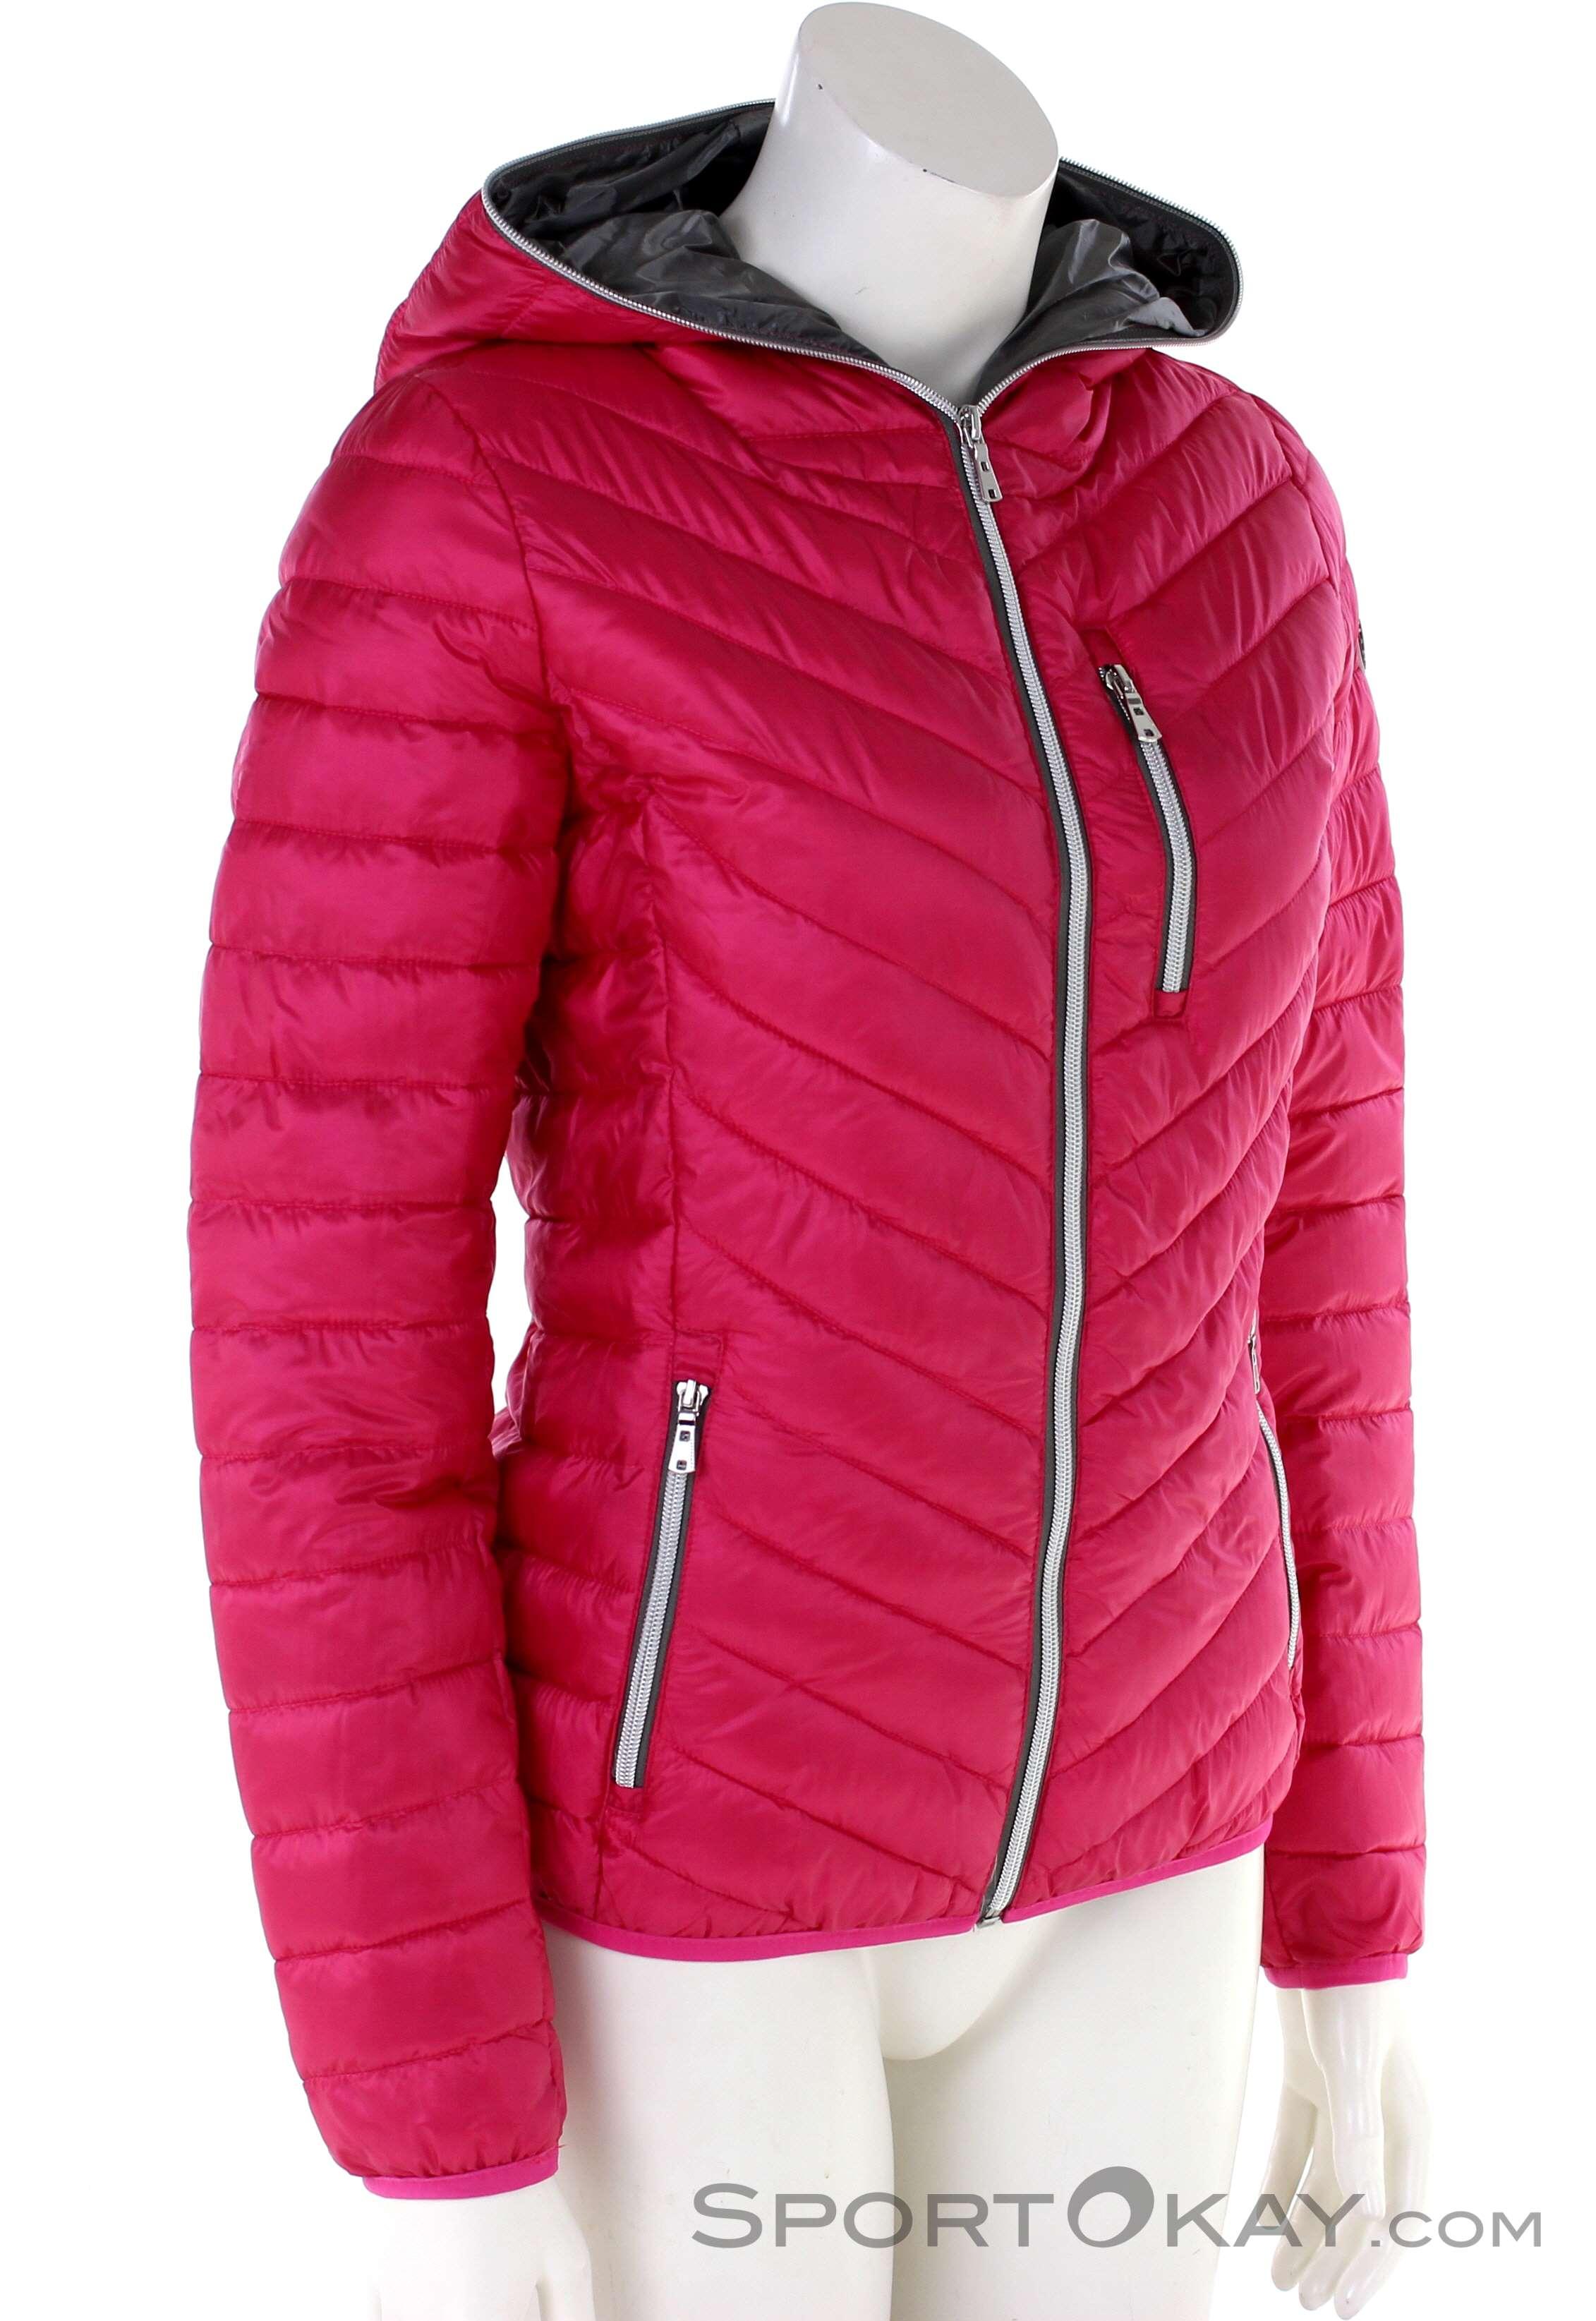 Sun Valley Remine Jacket Damen Outdoorjacke Jacken